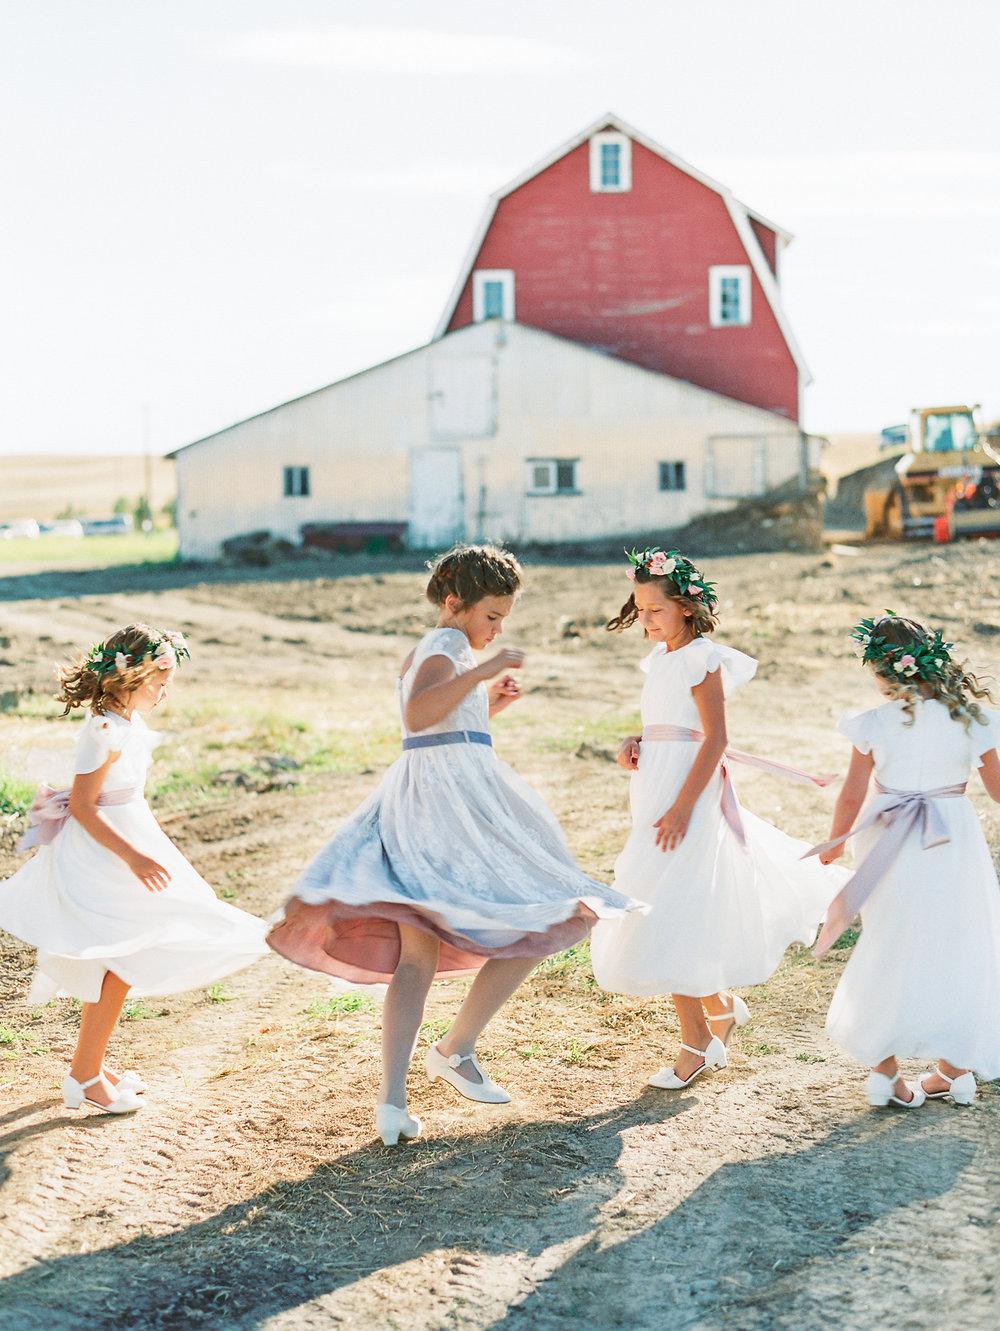 Idaho-Field-Forest-Wedding-Film-Photographer-Kristina-Adams-616 (2).jpg